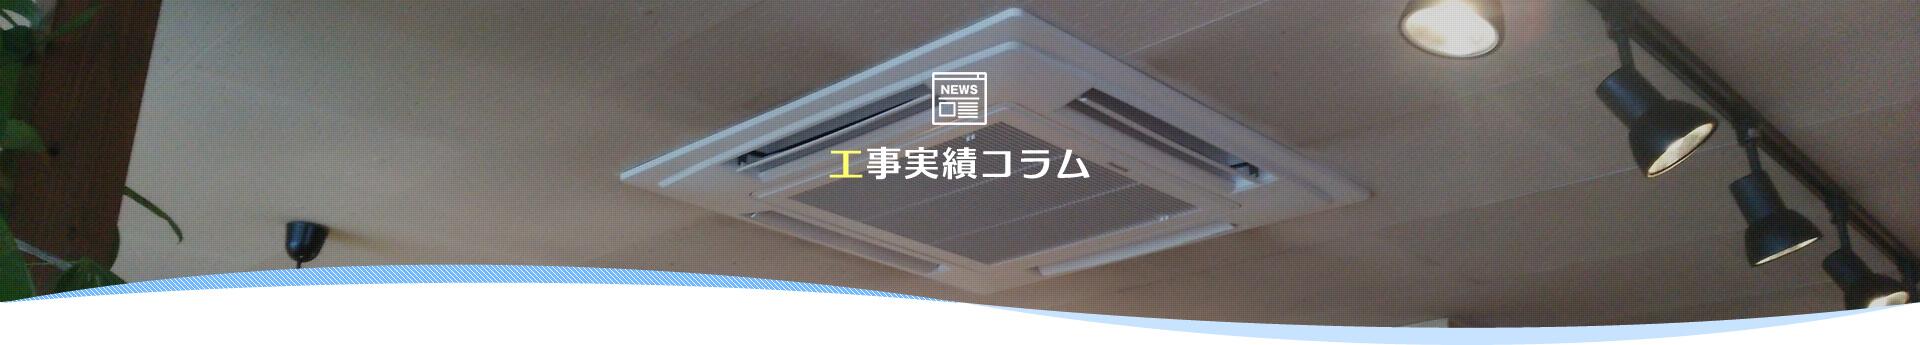 recruit.html | エアコンアシスト福岡